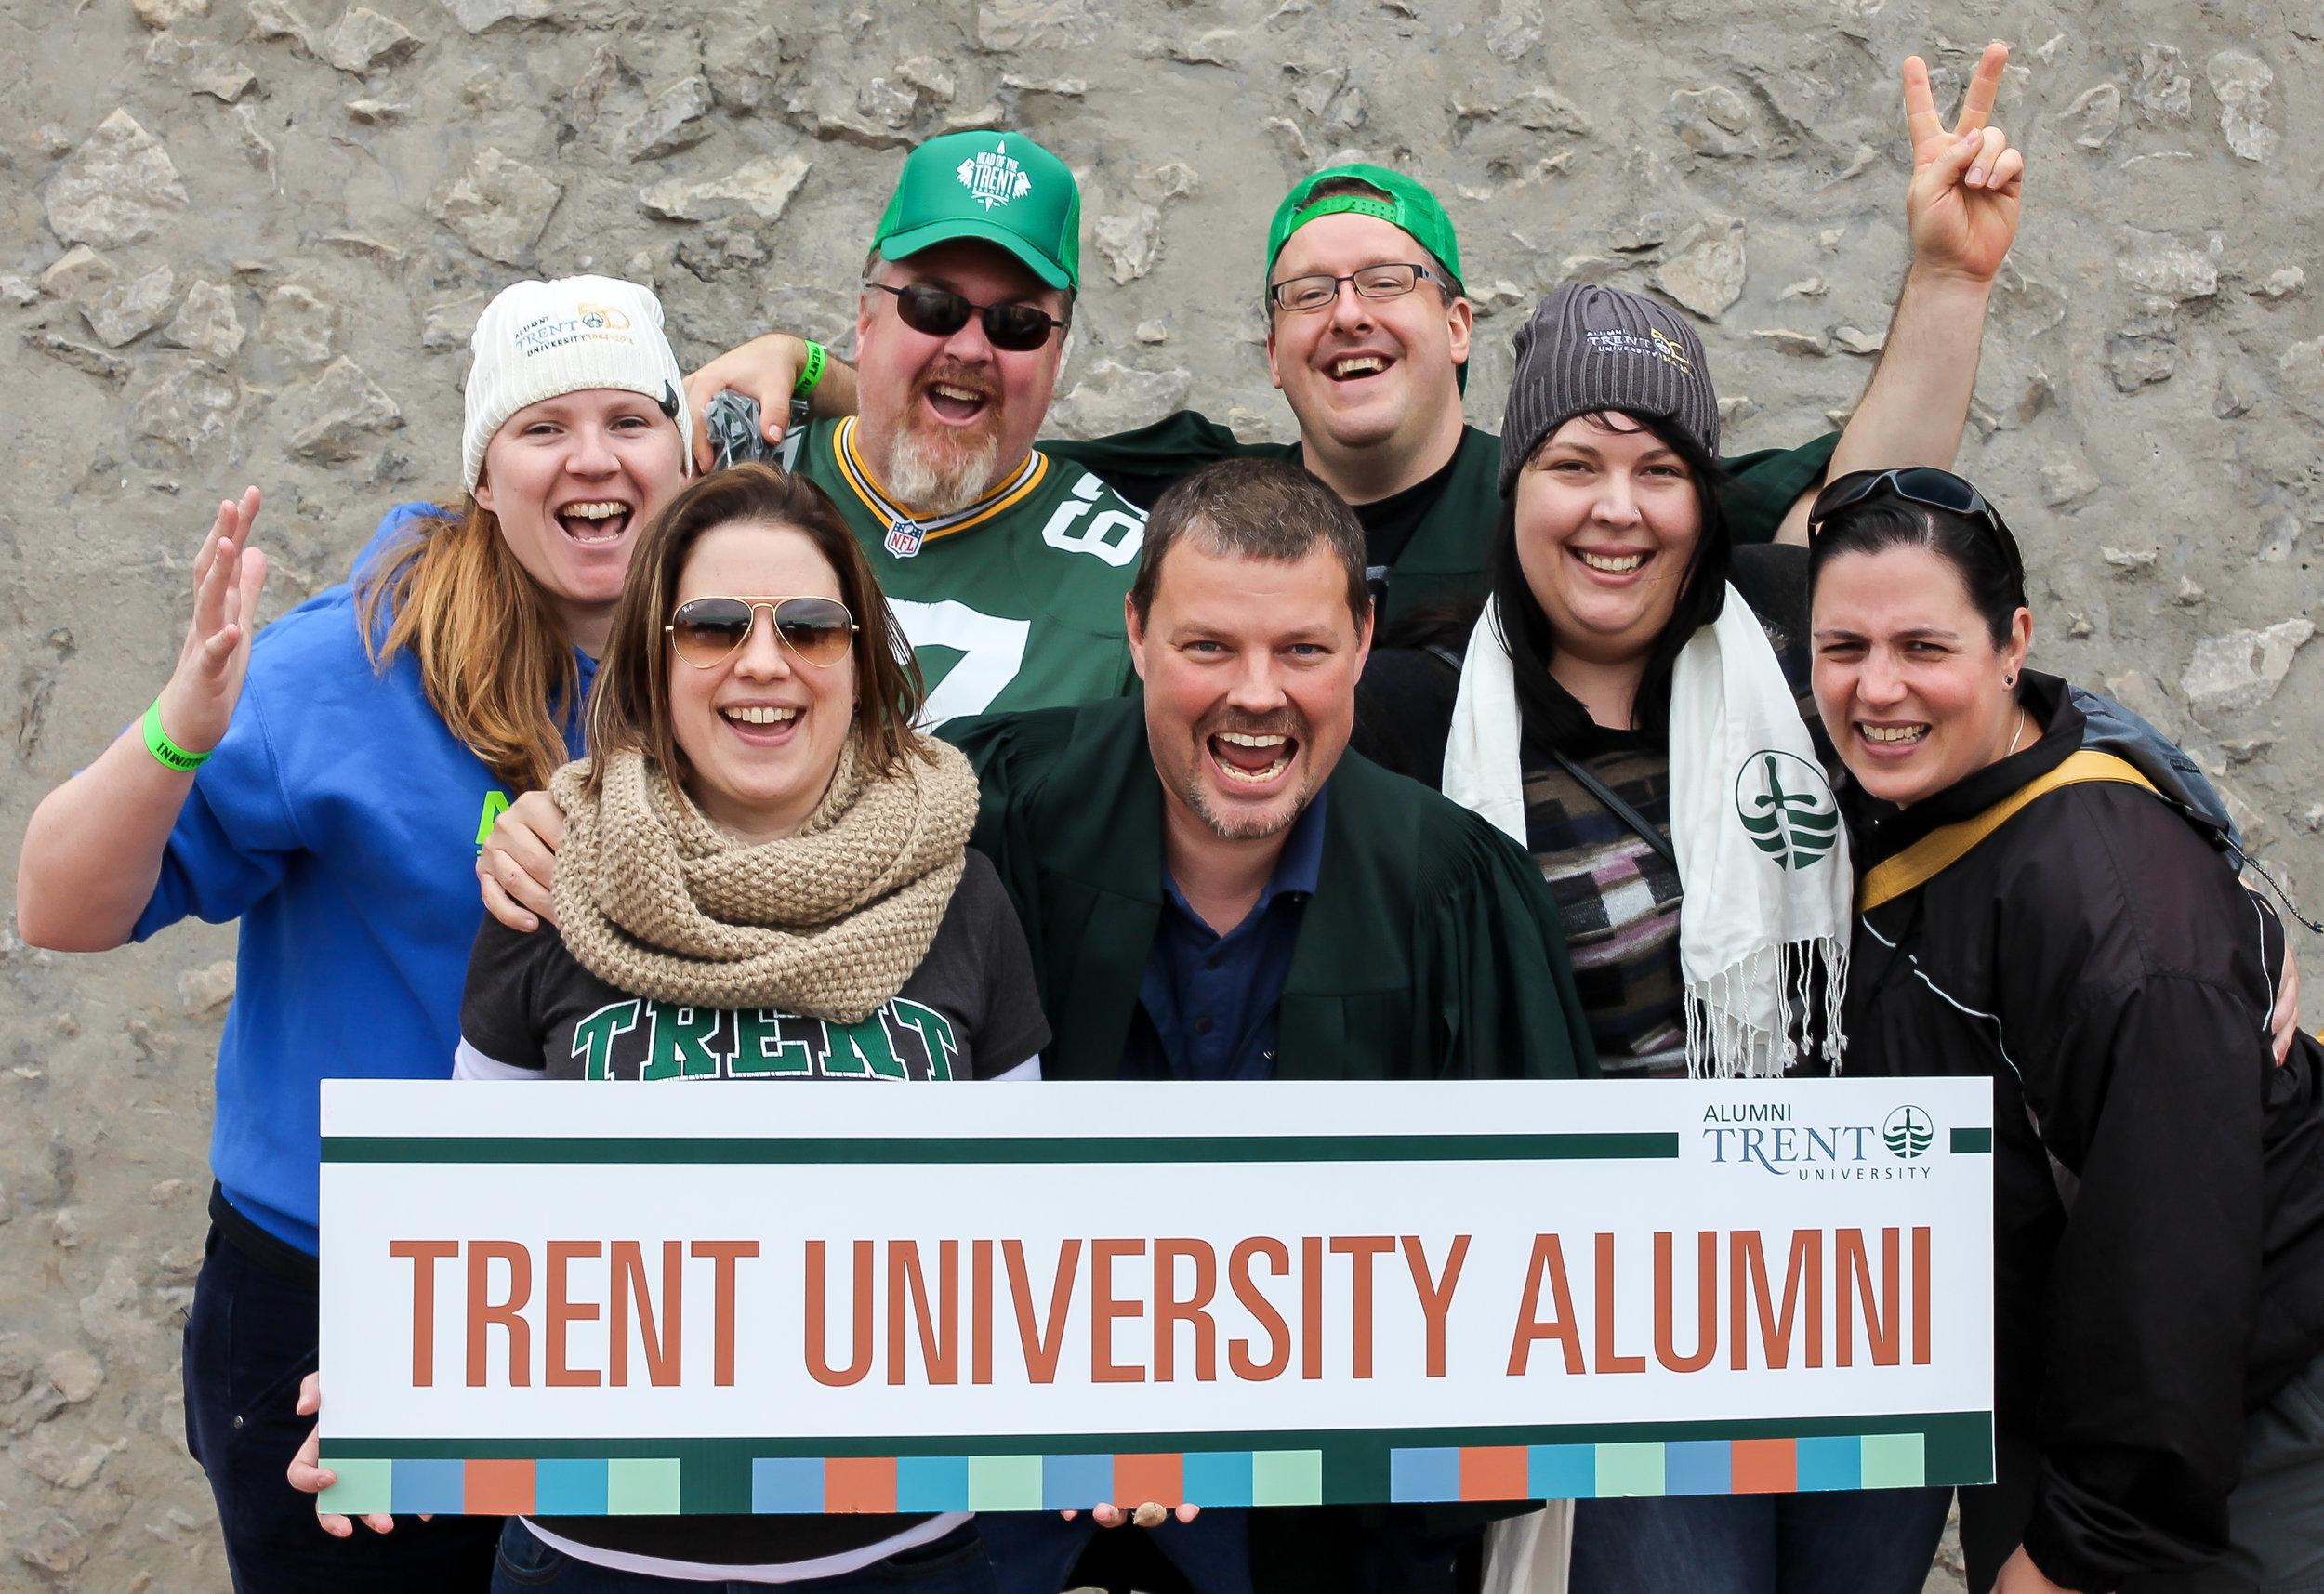 Photo courtesy Trent University